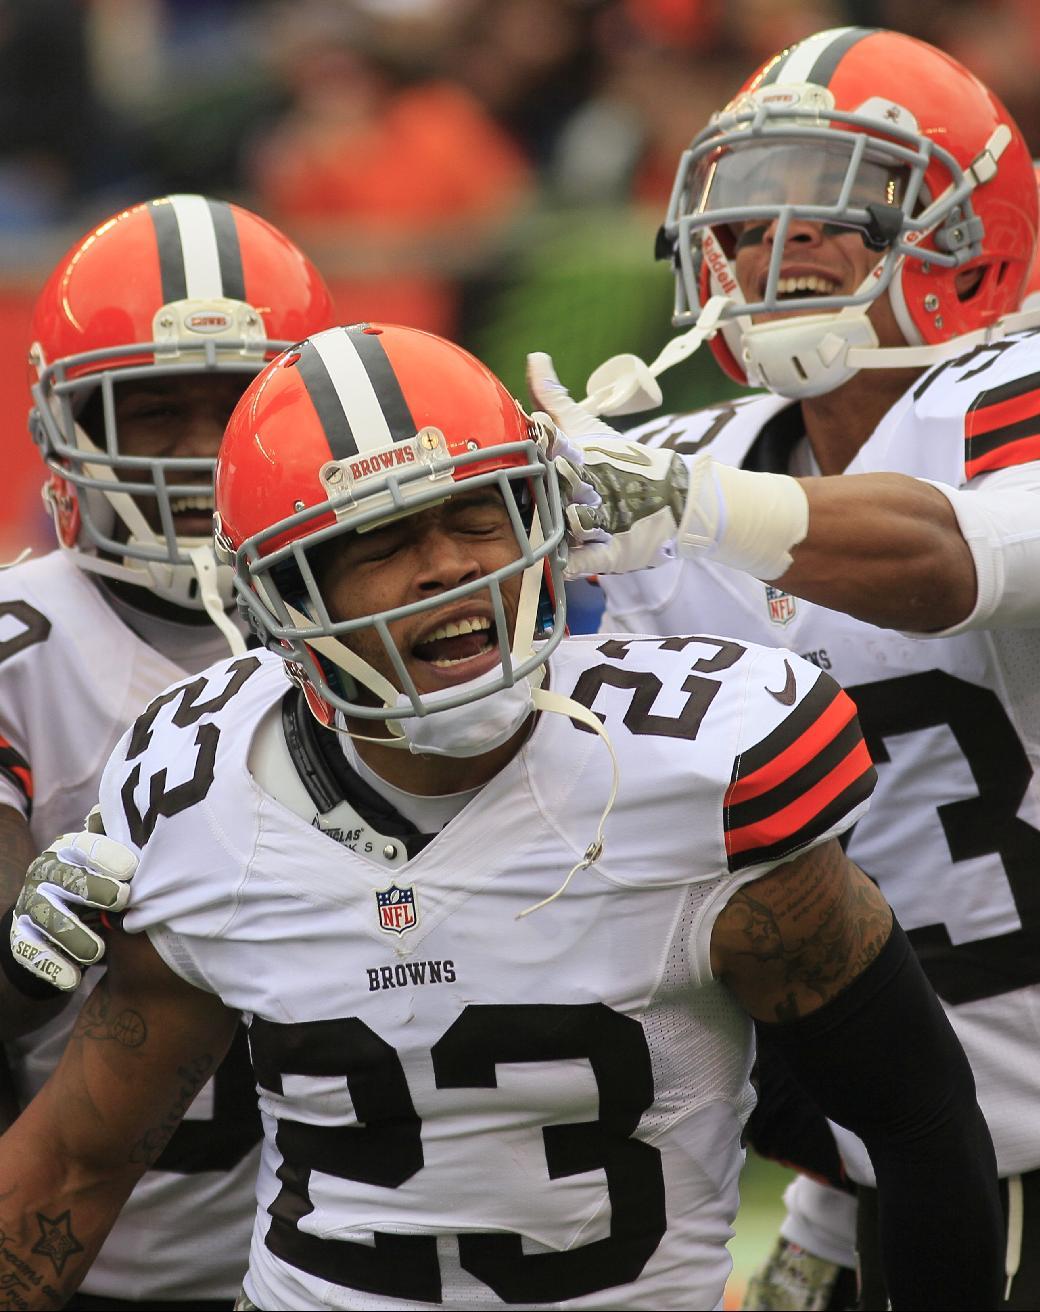 Browns' Haden moves into elite cornerback class